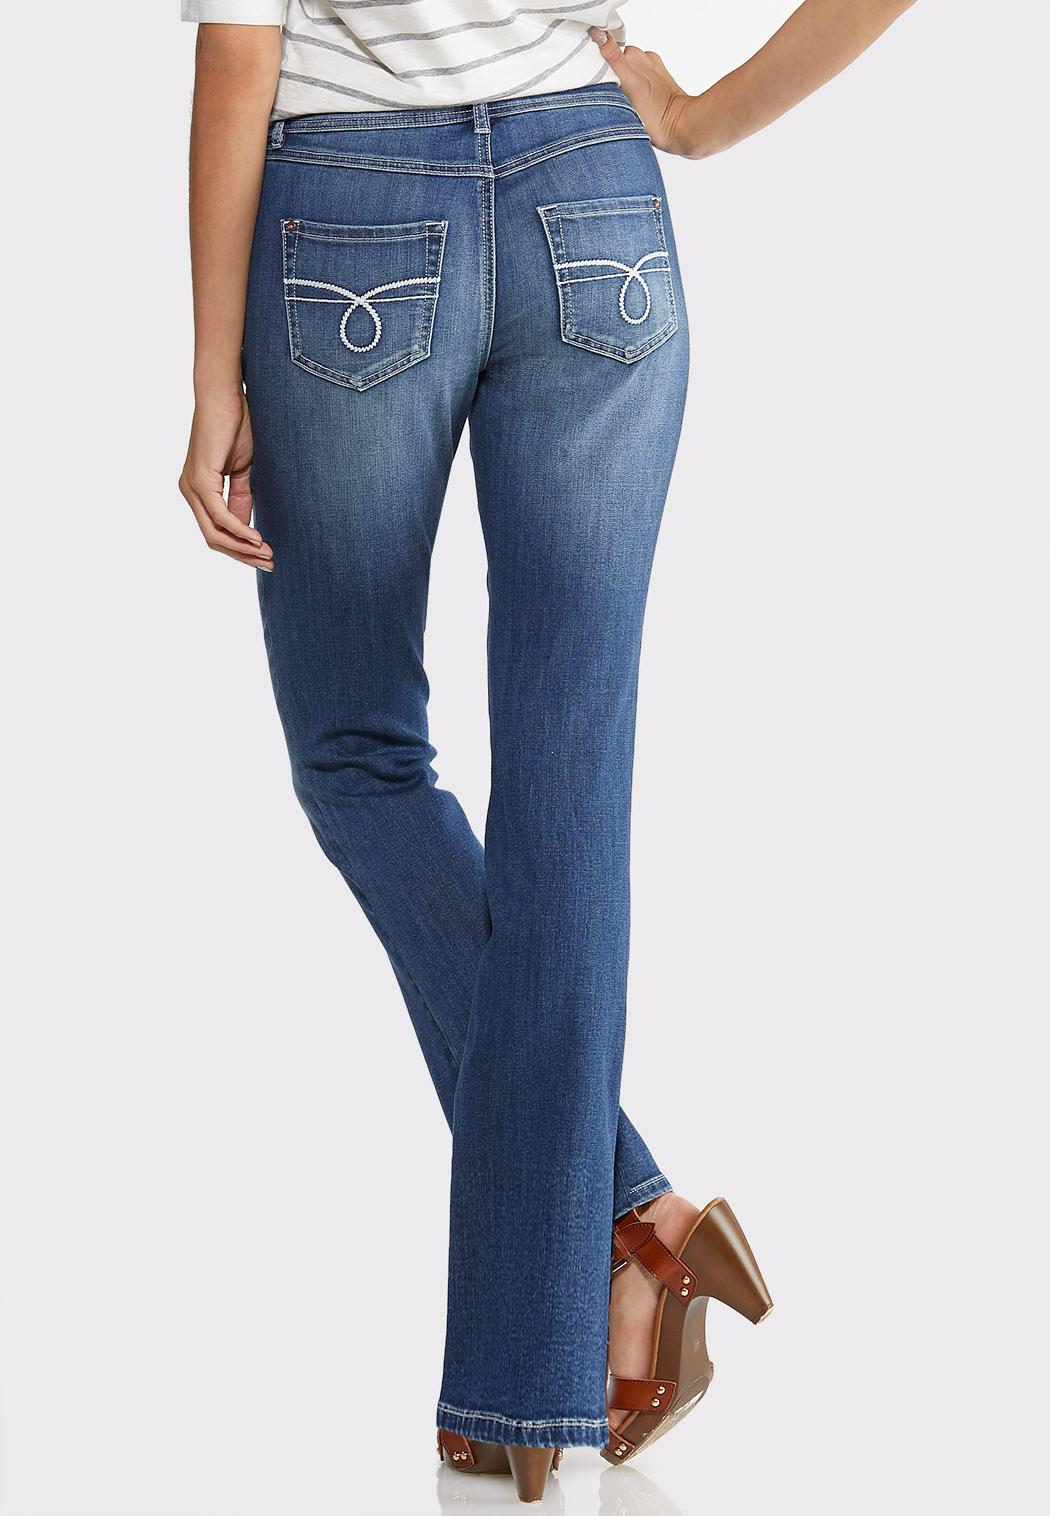 Petite Dark Wash Bootcut Jeans (Item #43929316)